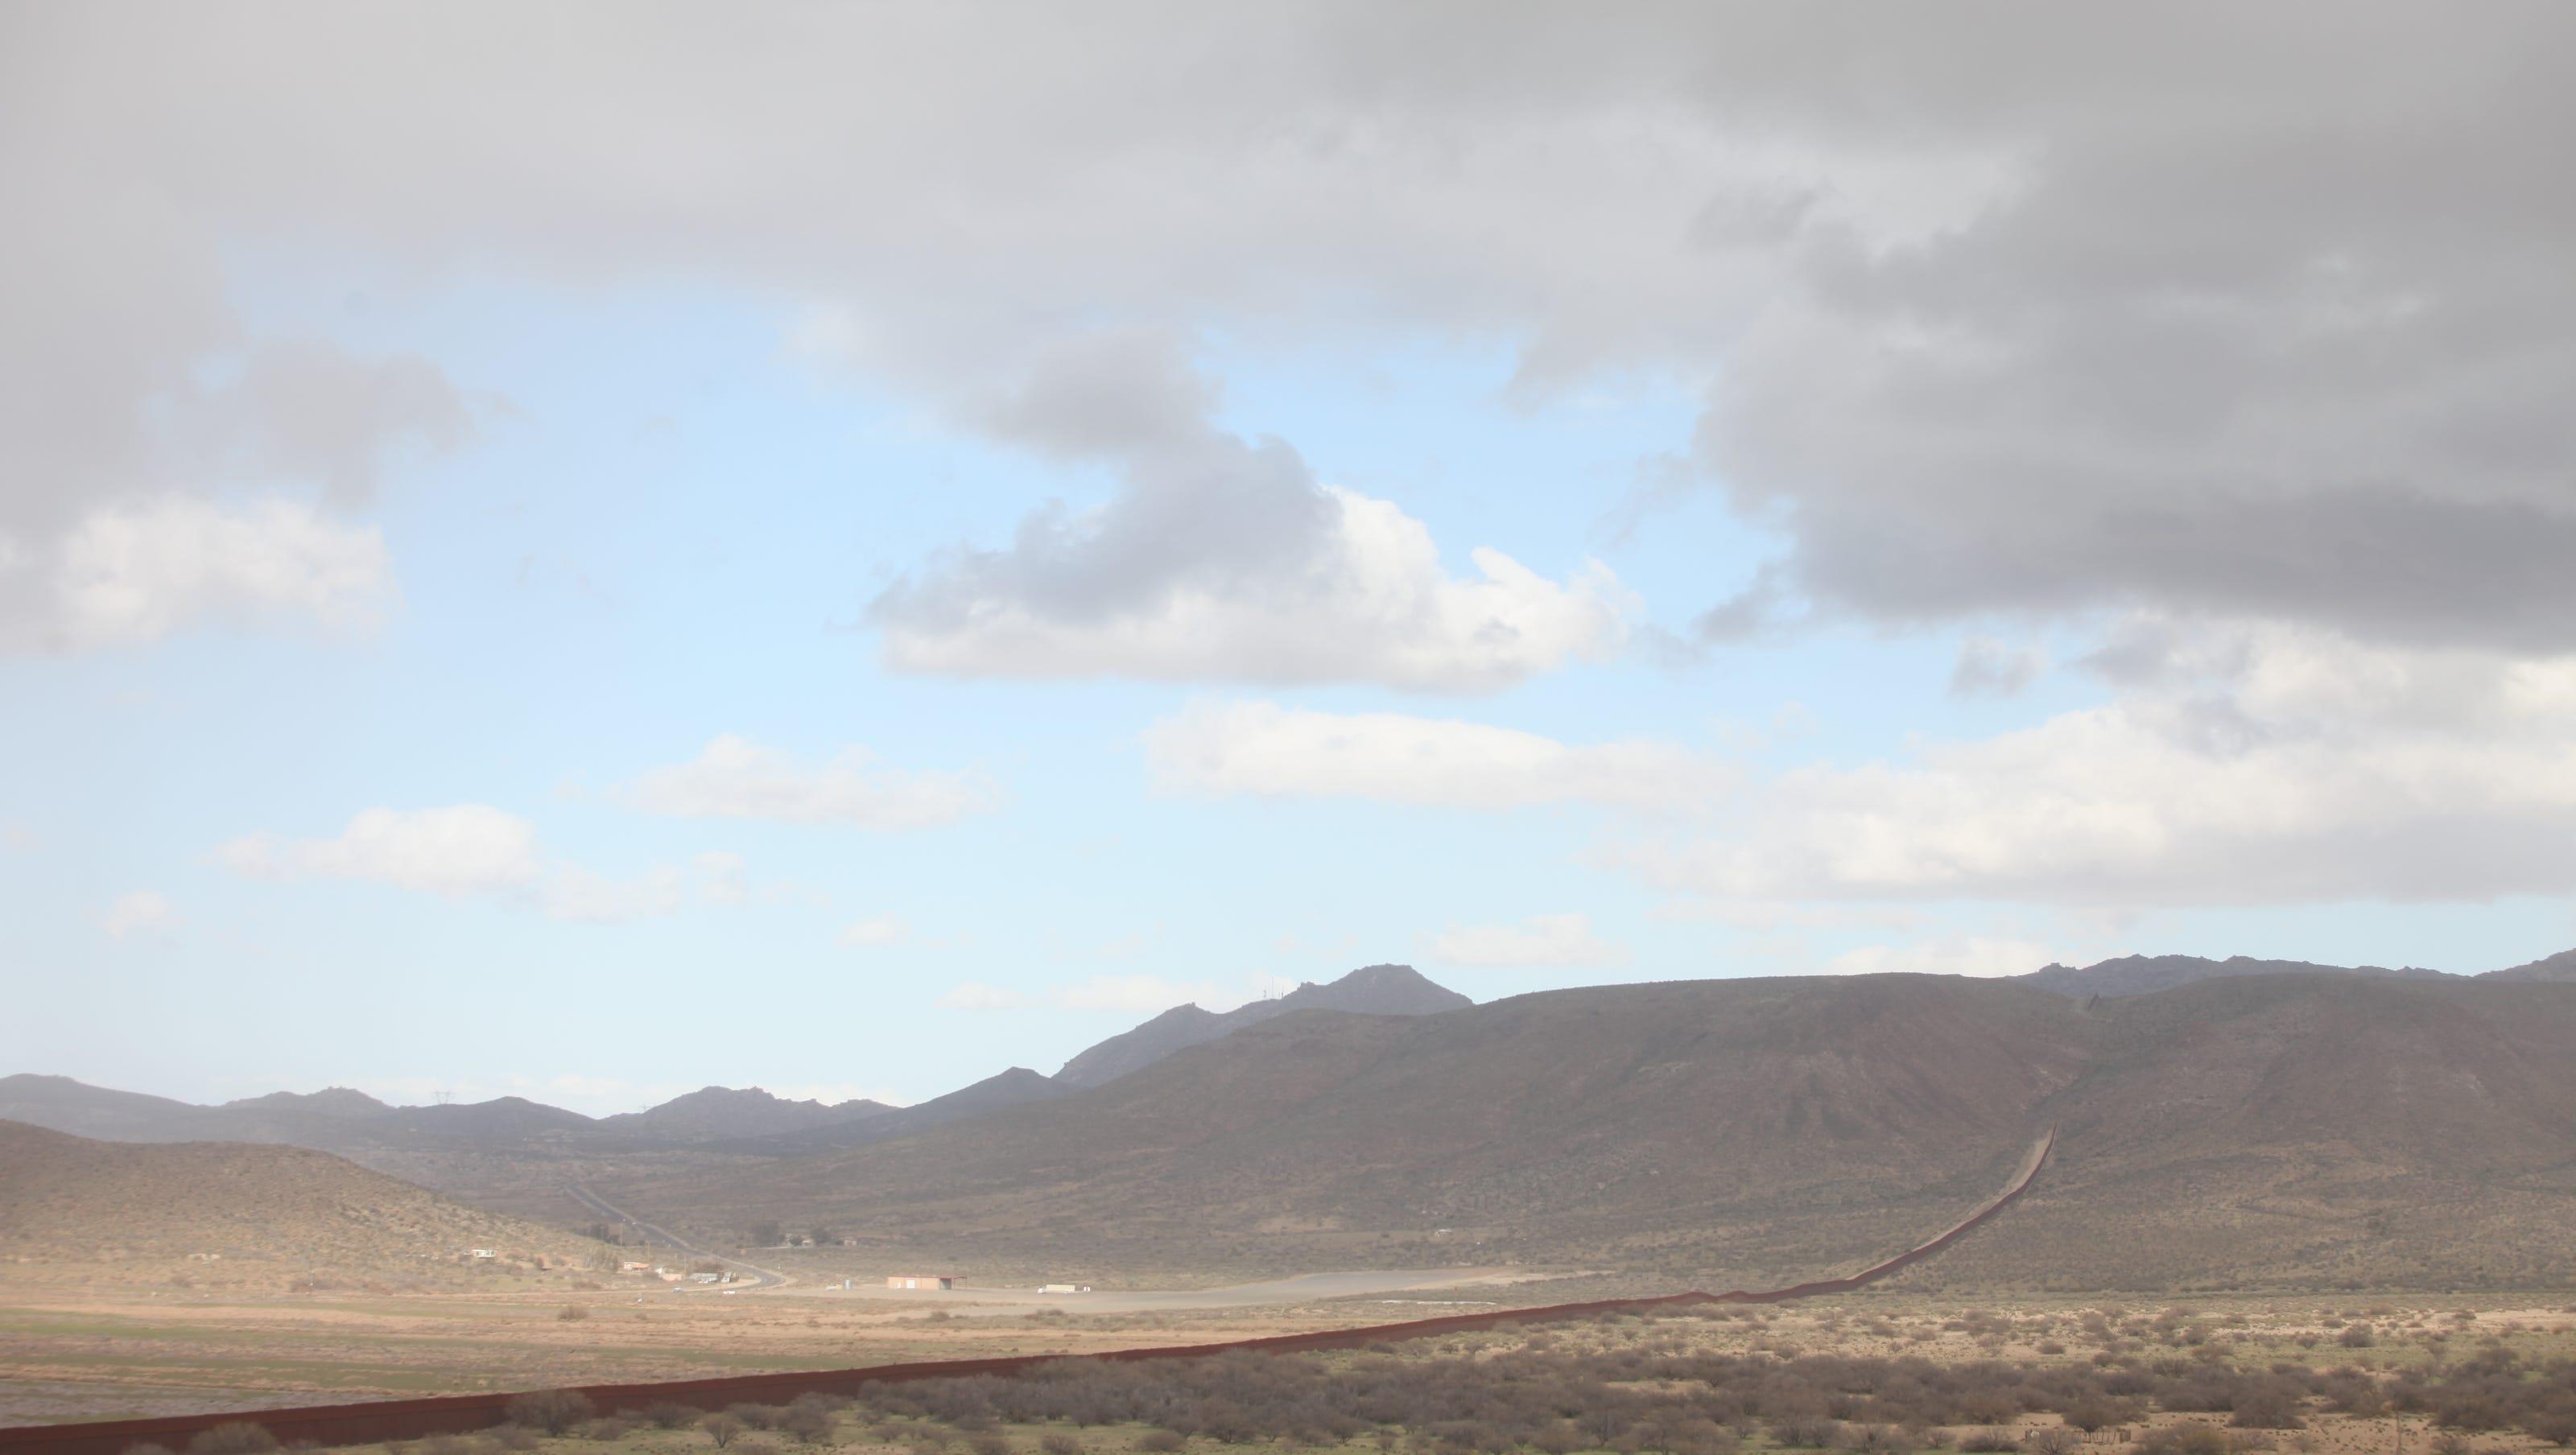 www.desertsun.com